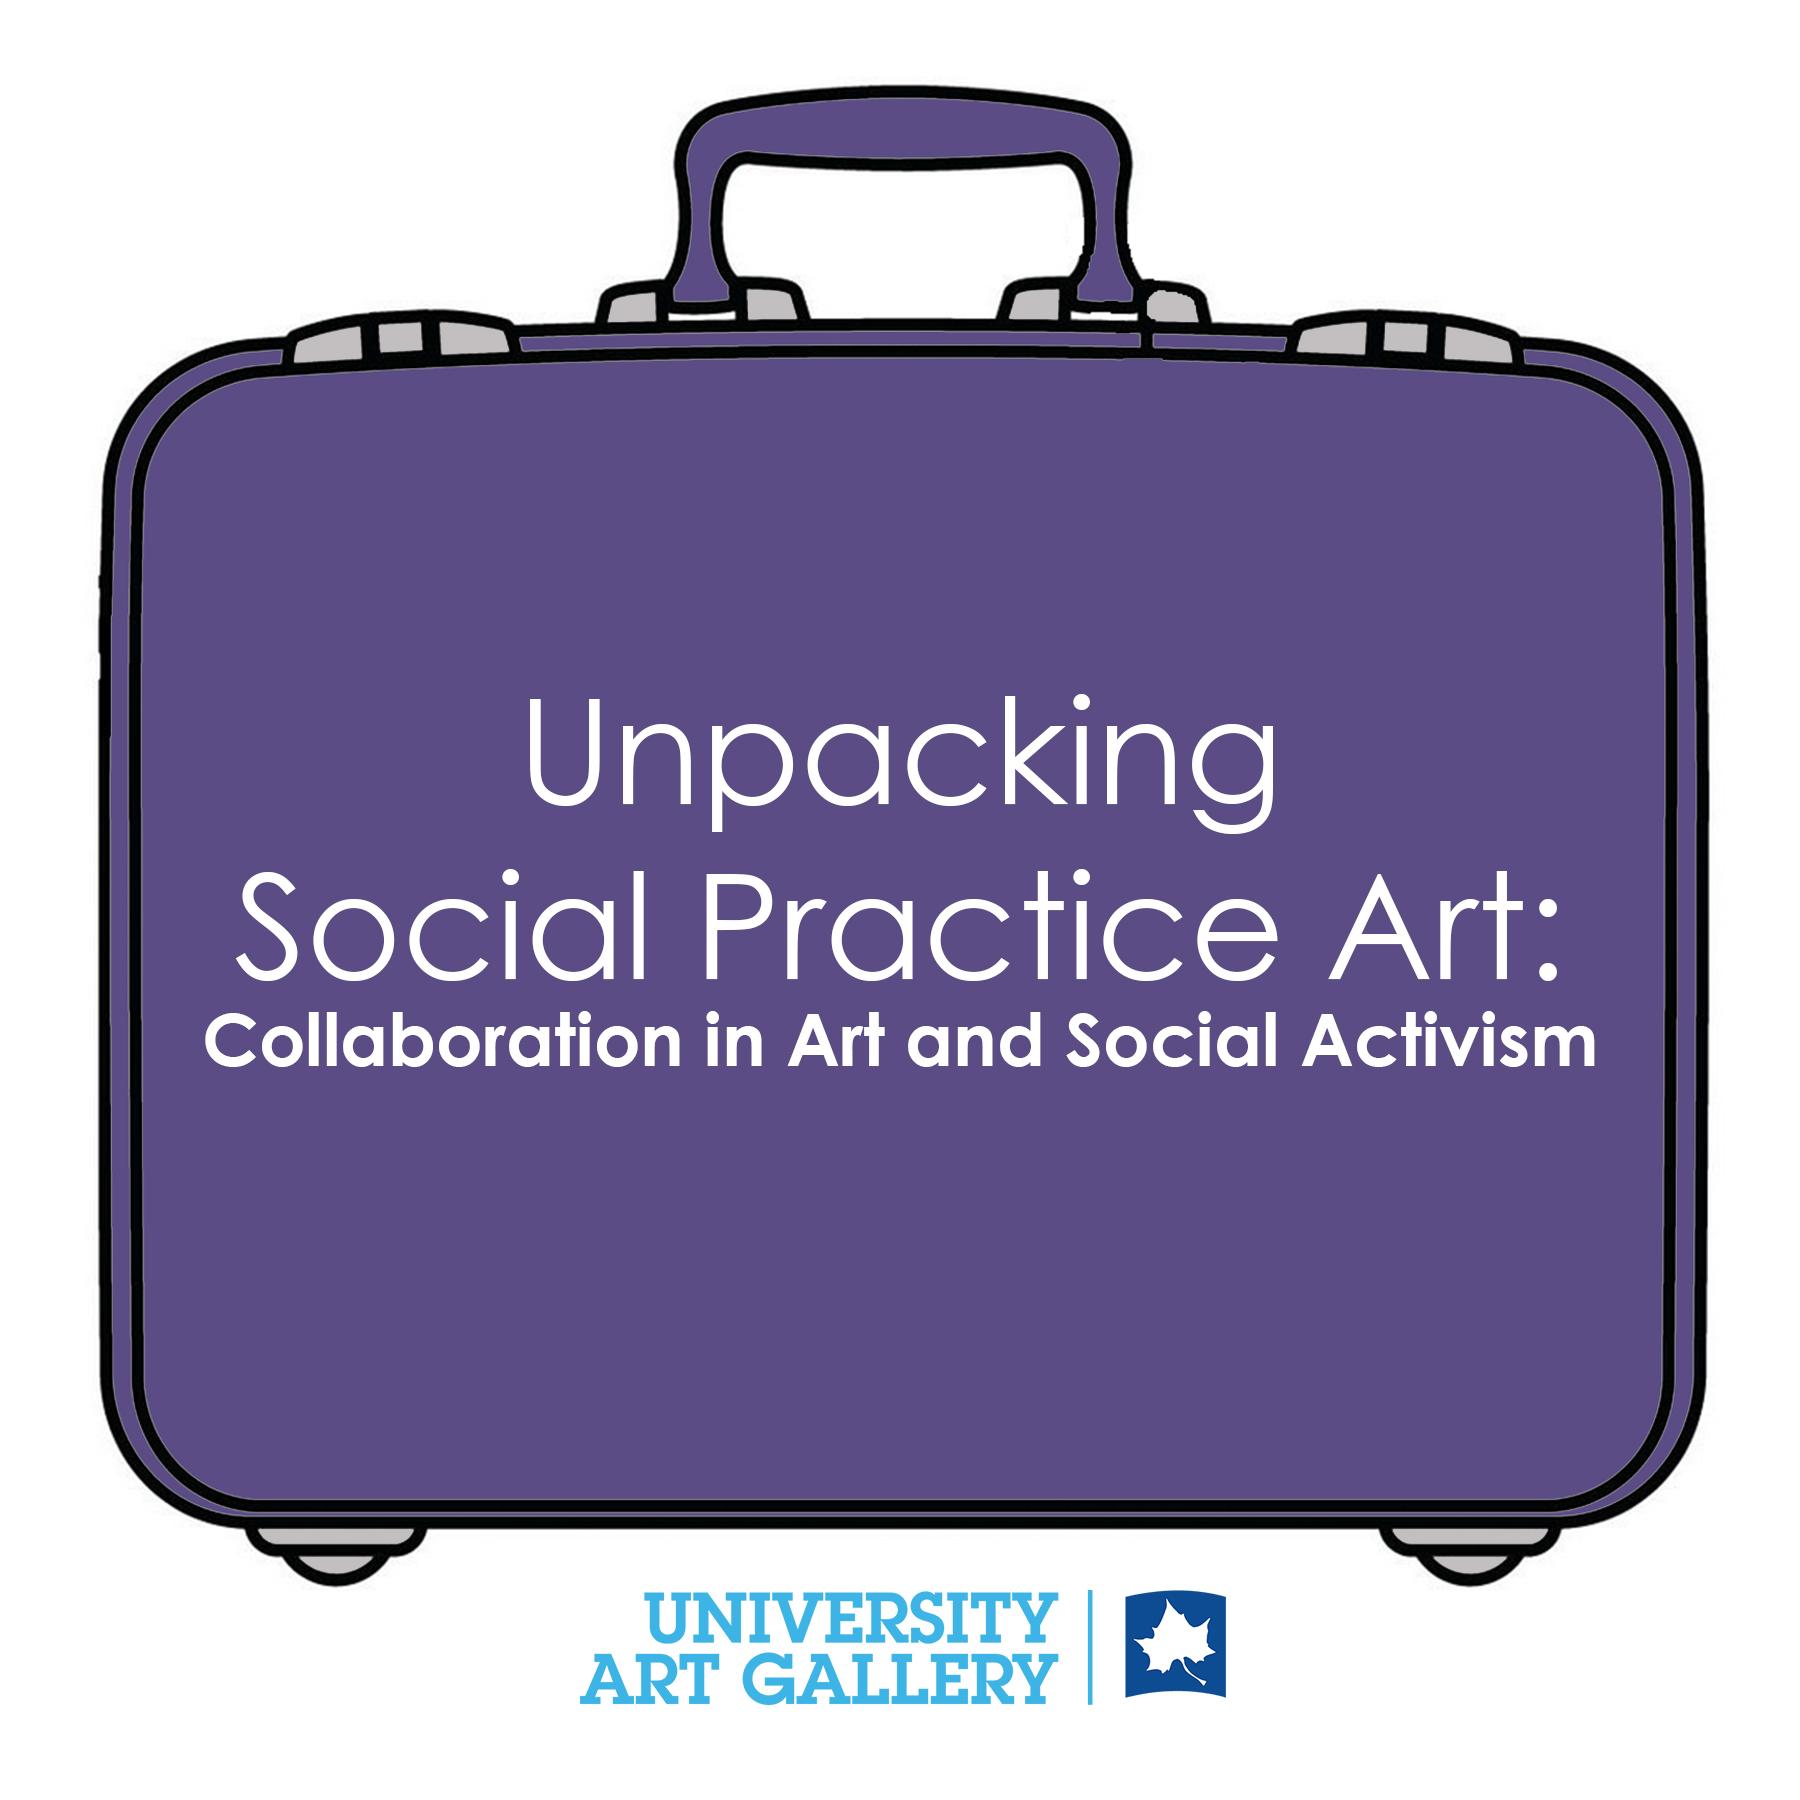 unpacking social practice art